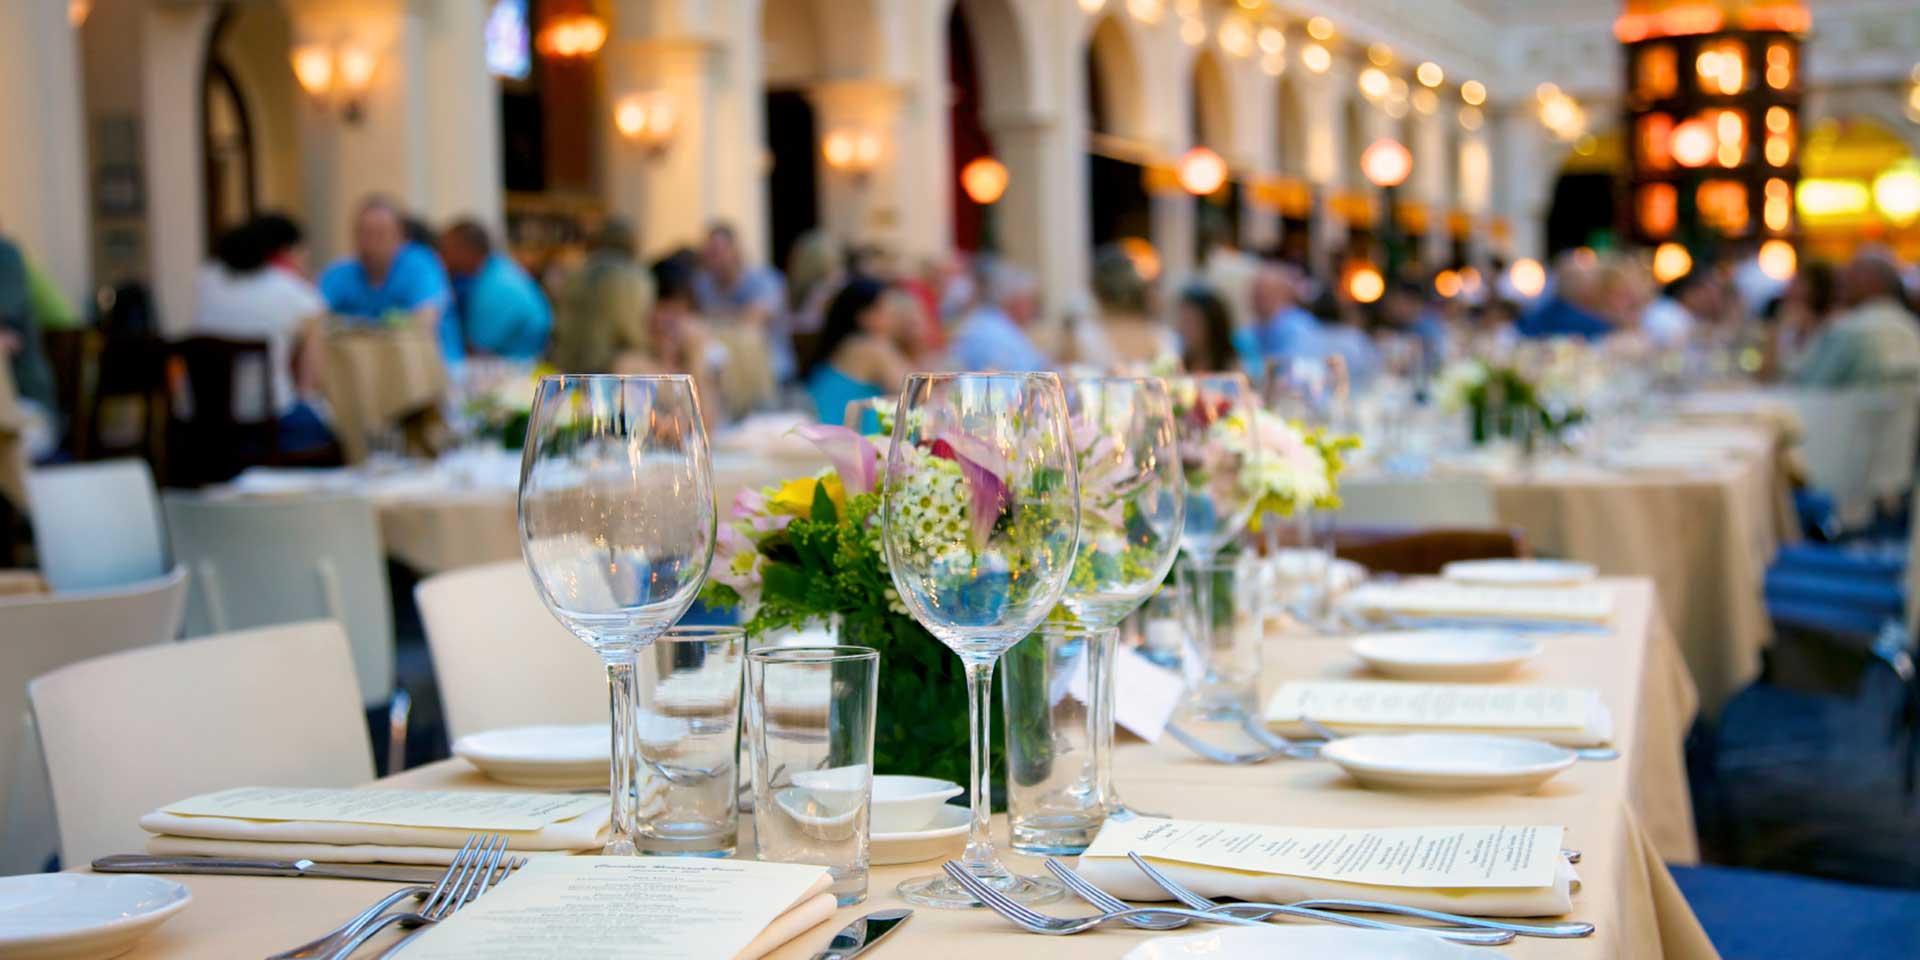 Easton Town Center Restaurants Nightlifehilton Columbus At Easton